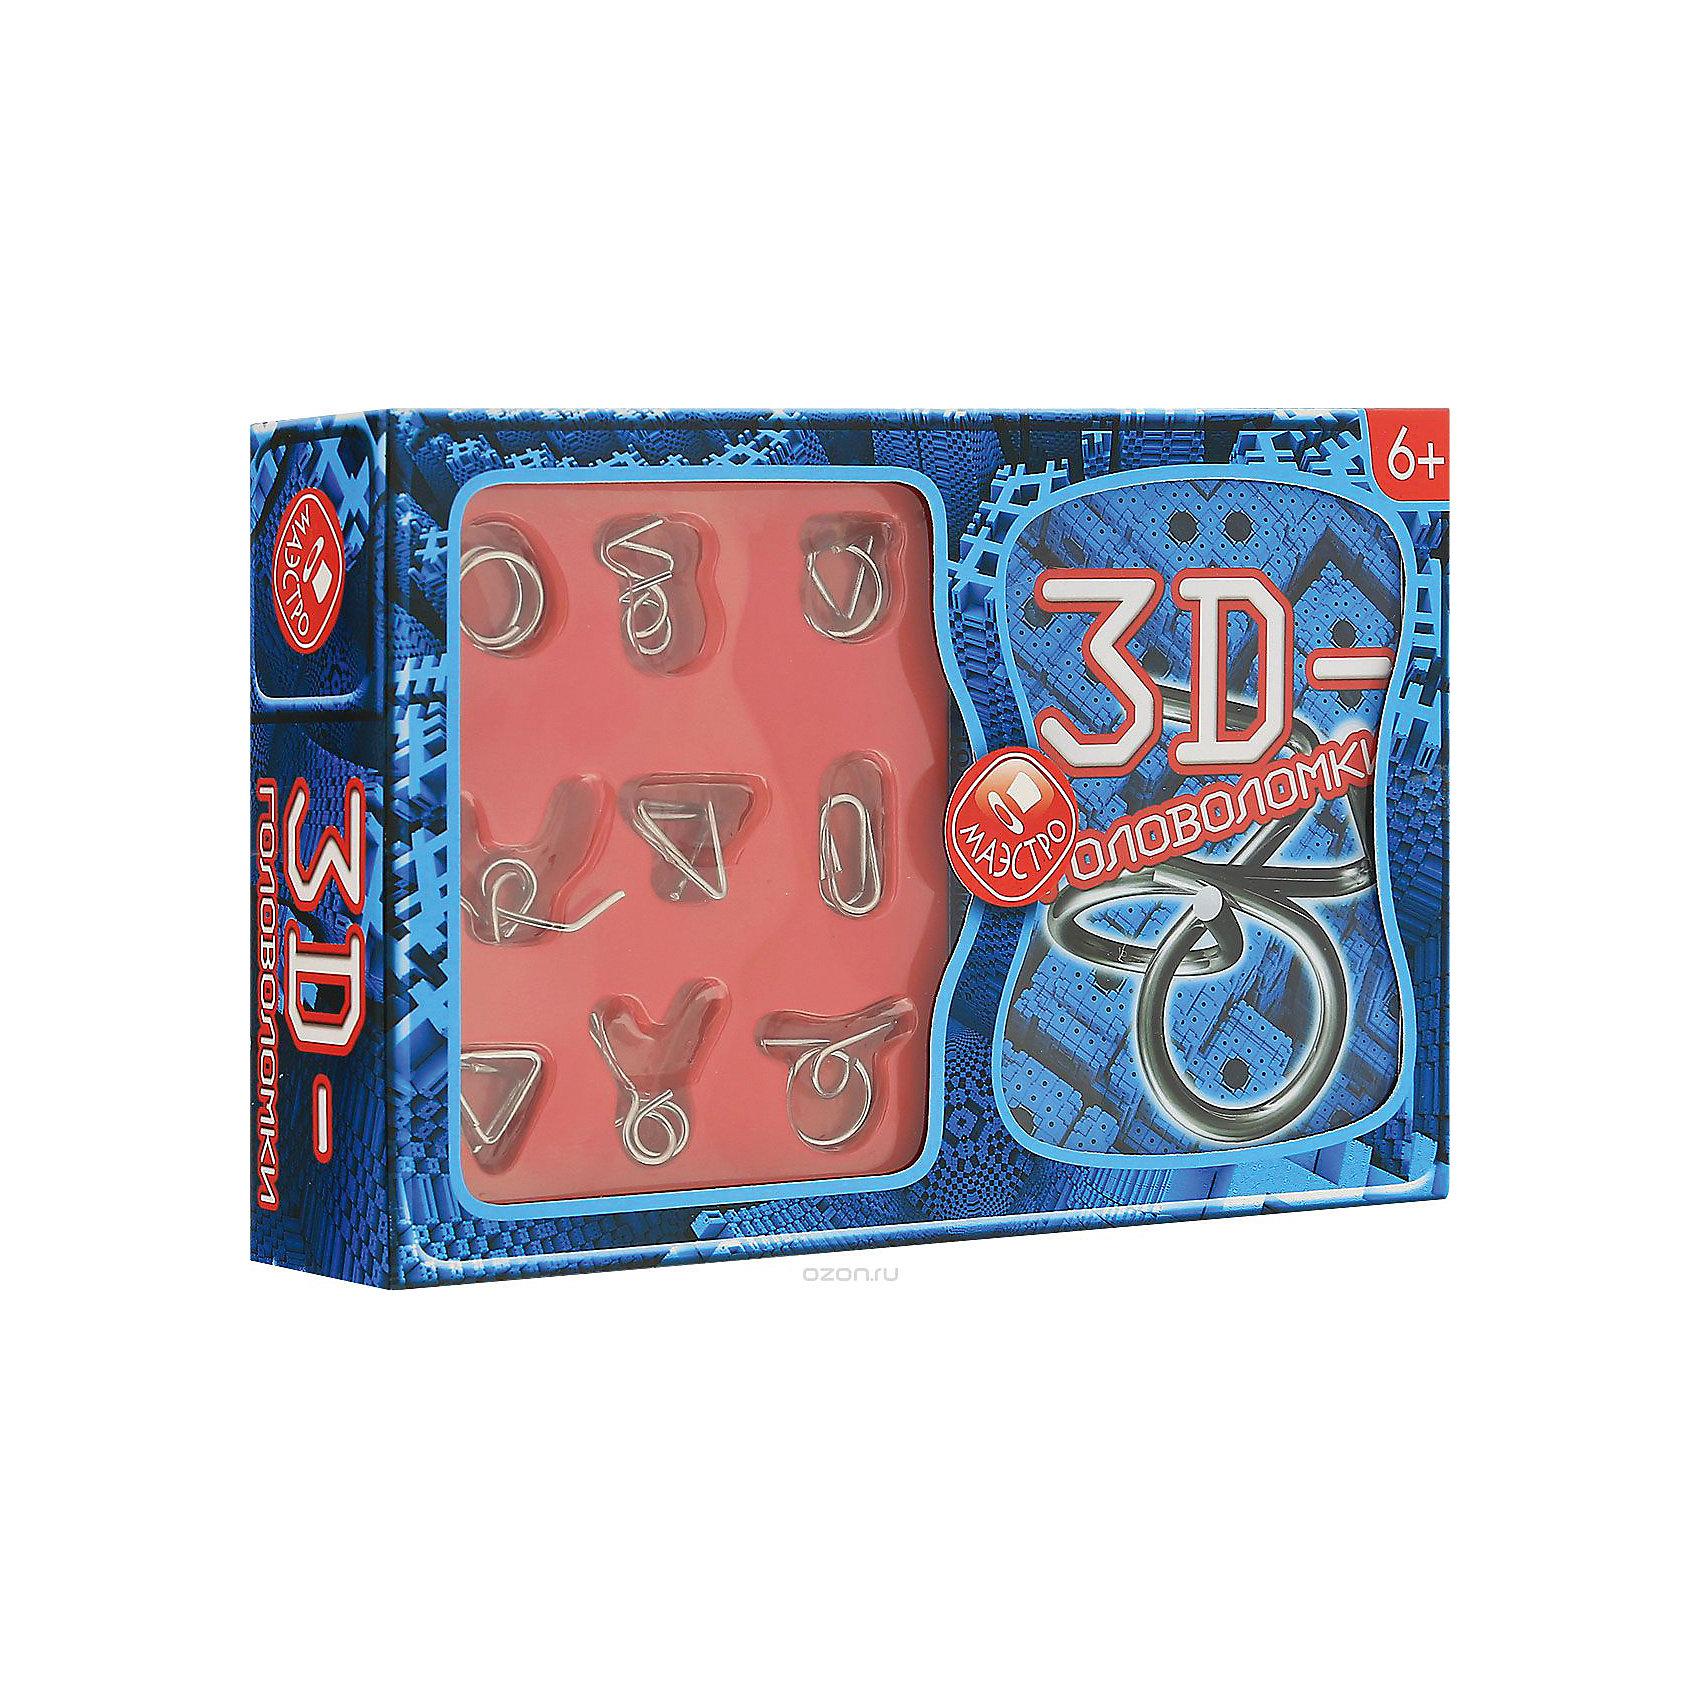 3D головоломкиКнига + 9 металлических головоломок<br><br>Ширина мм: 250<br>Глубина мм: 160<br>Высота мм: 60<br>Вес г: 300<br>Возраст от месяцев: 36<br>Возраст до месяцев: 144<br>Пол: Унисекс<br>Возраст: Детский<br>SKU: 5142472